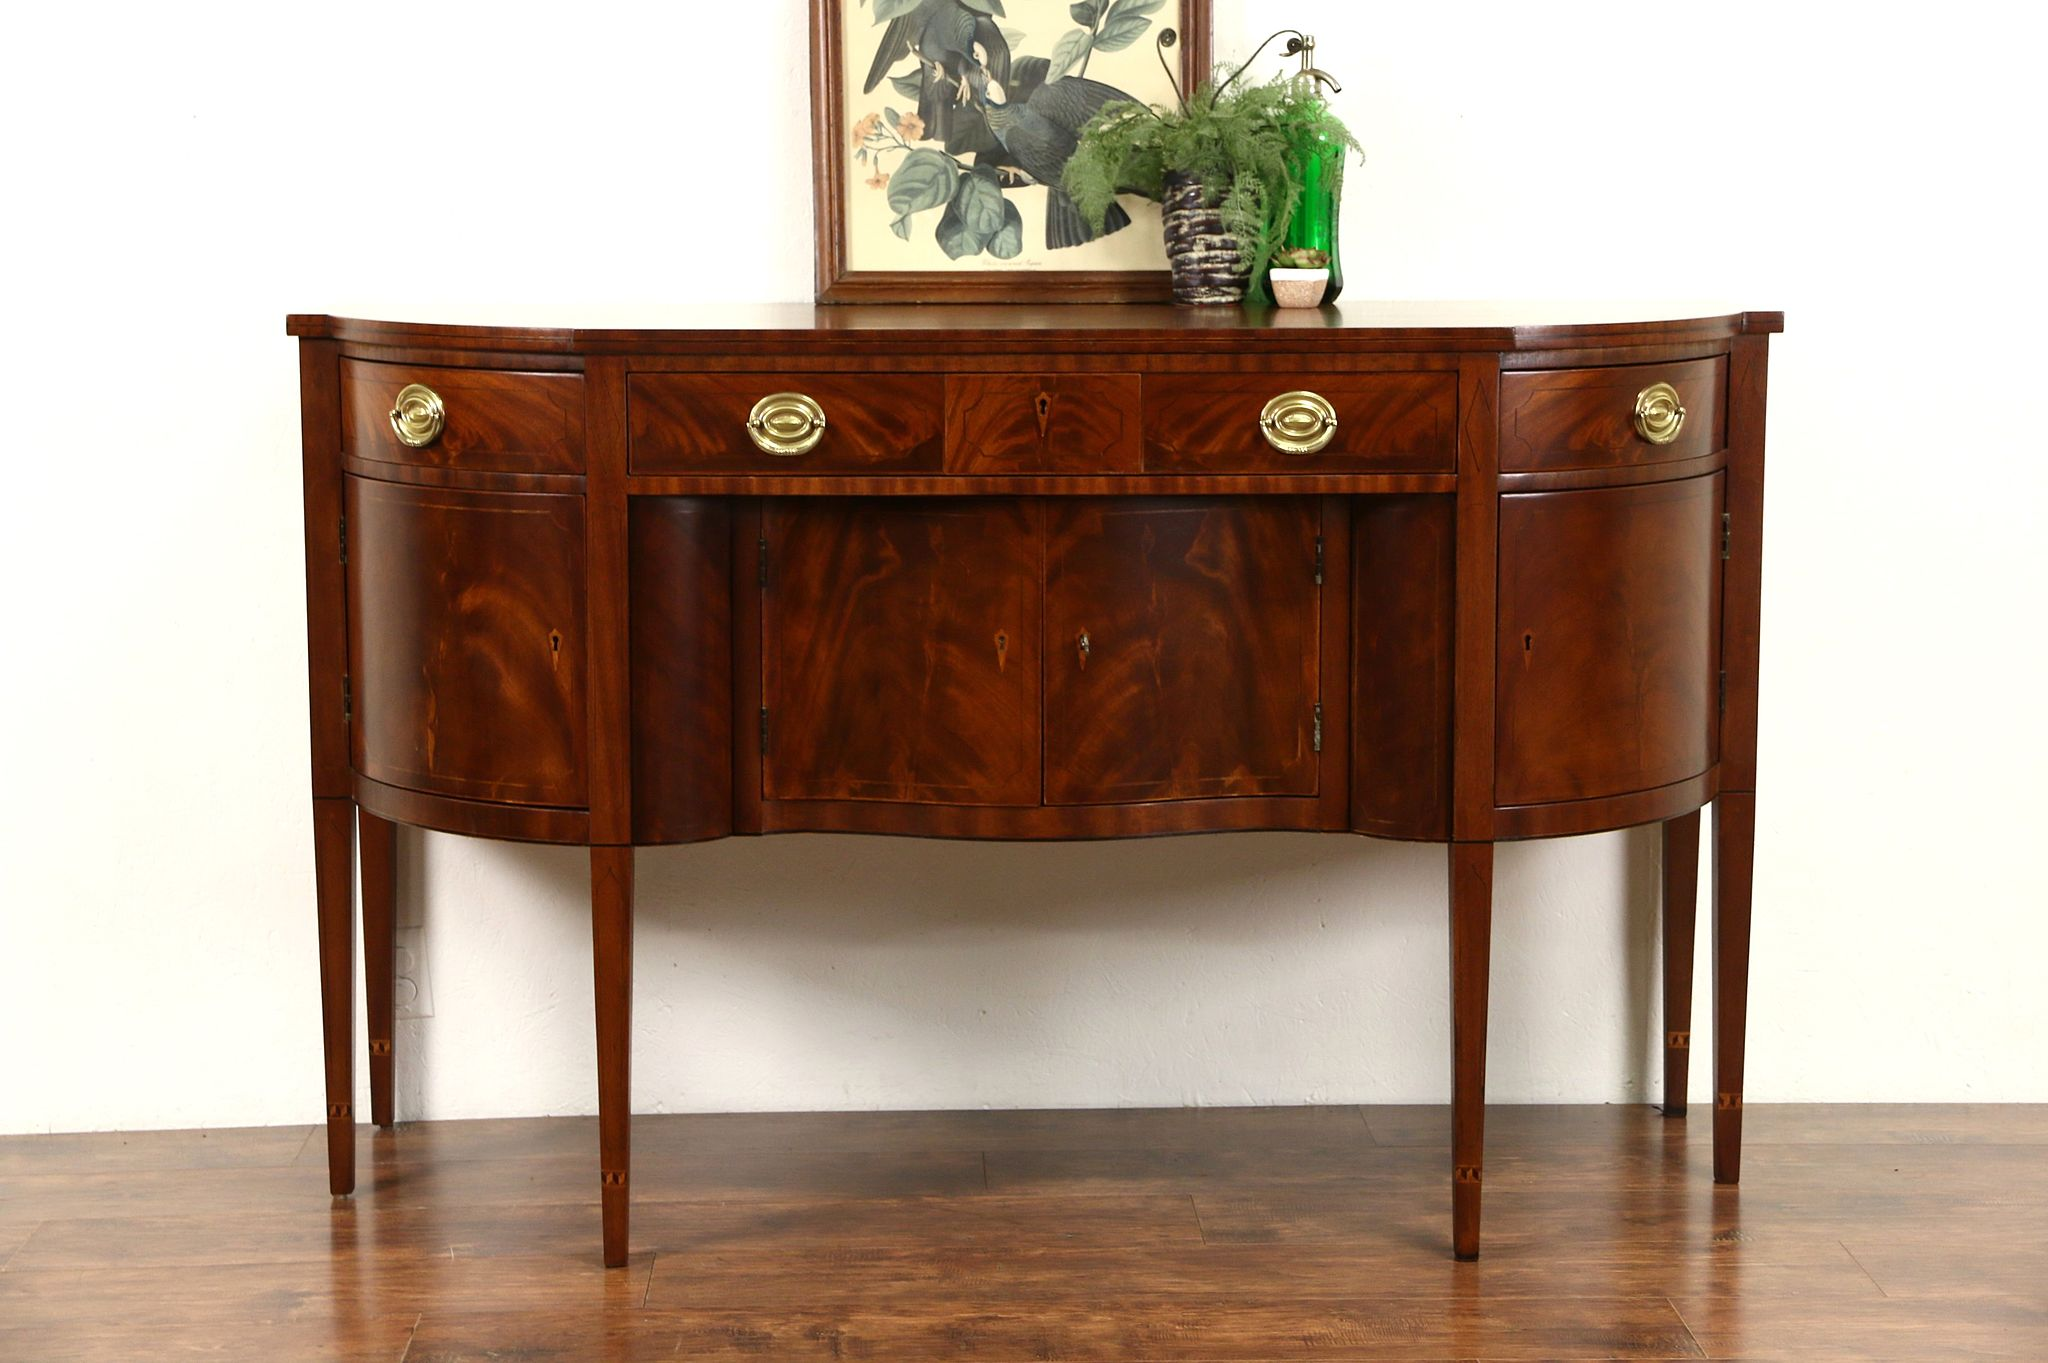 Sold Henredon Natchez Collection Vintage Mahogany Sideboard Buffet Or Server Harp Gallery Antiques Furniture